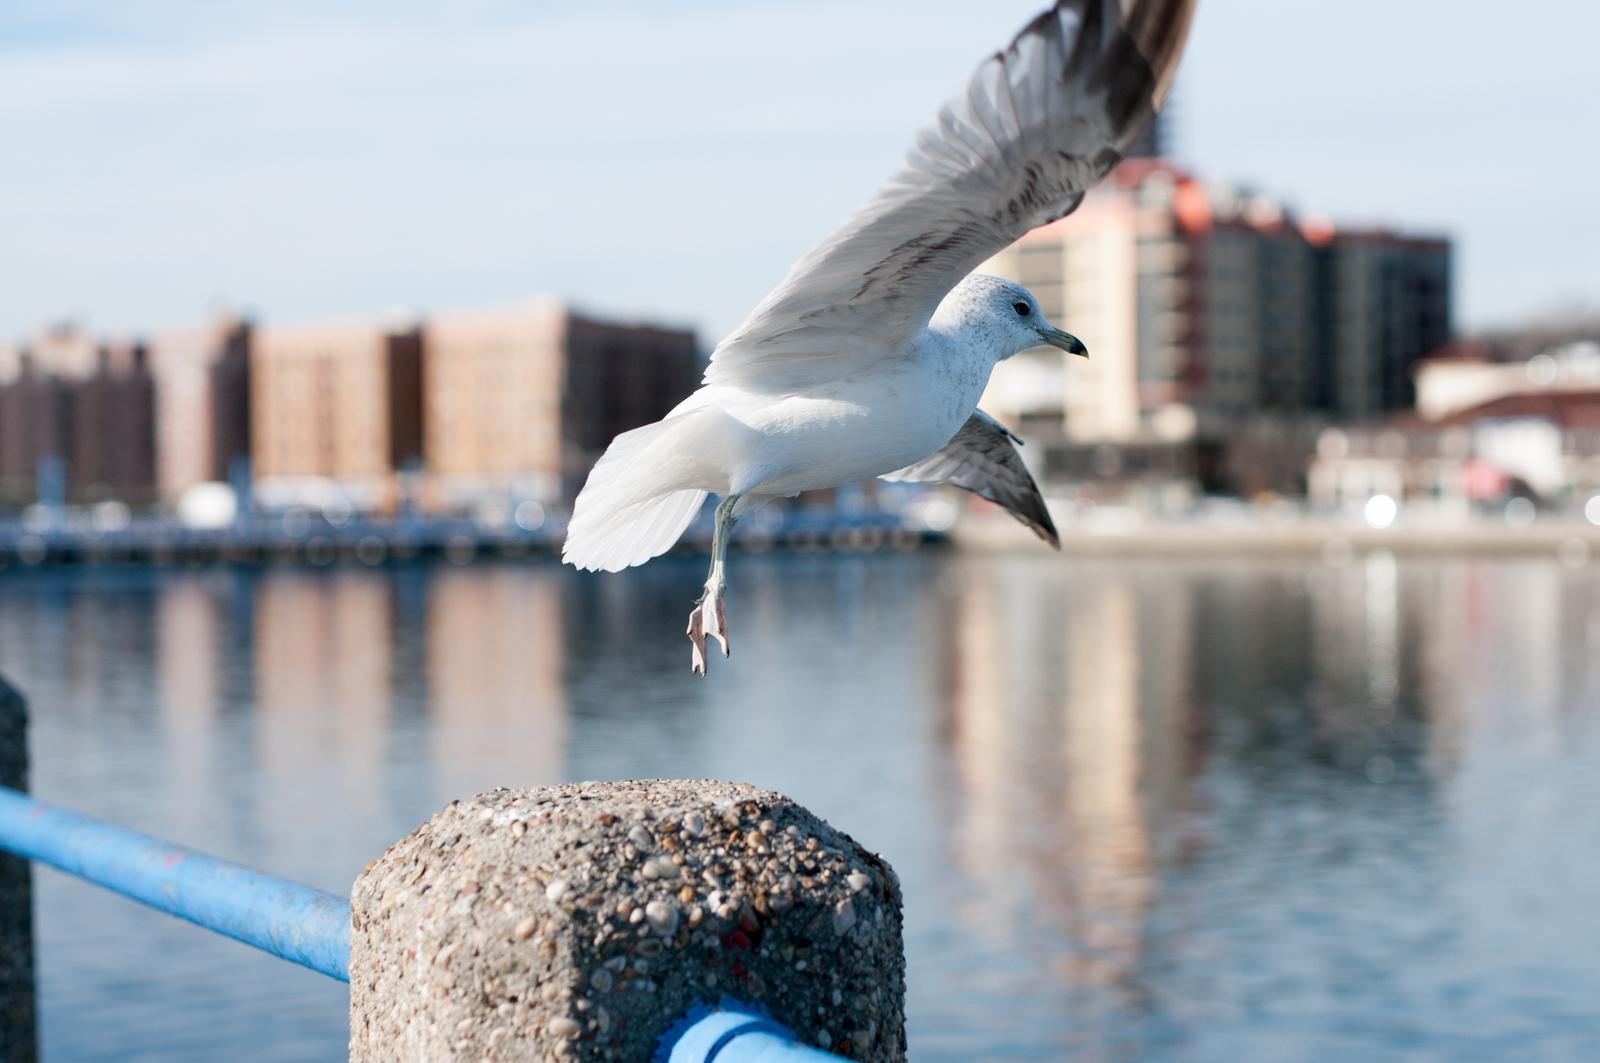 121916_Seagulls-3